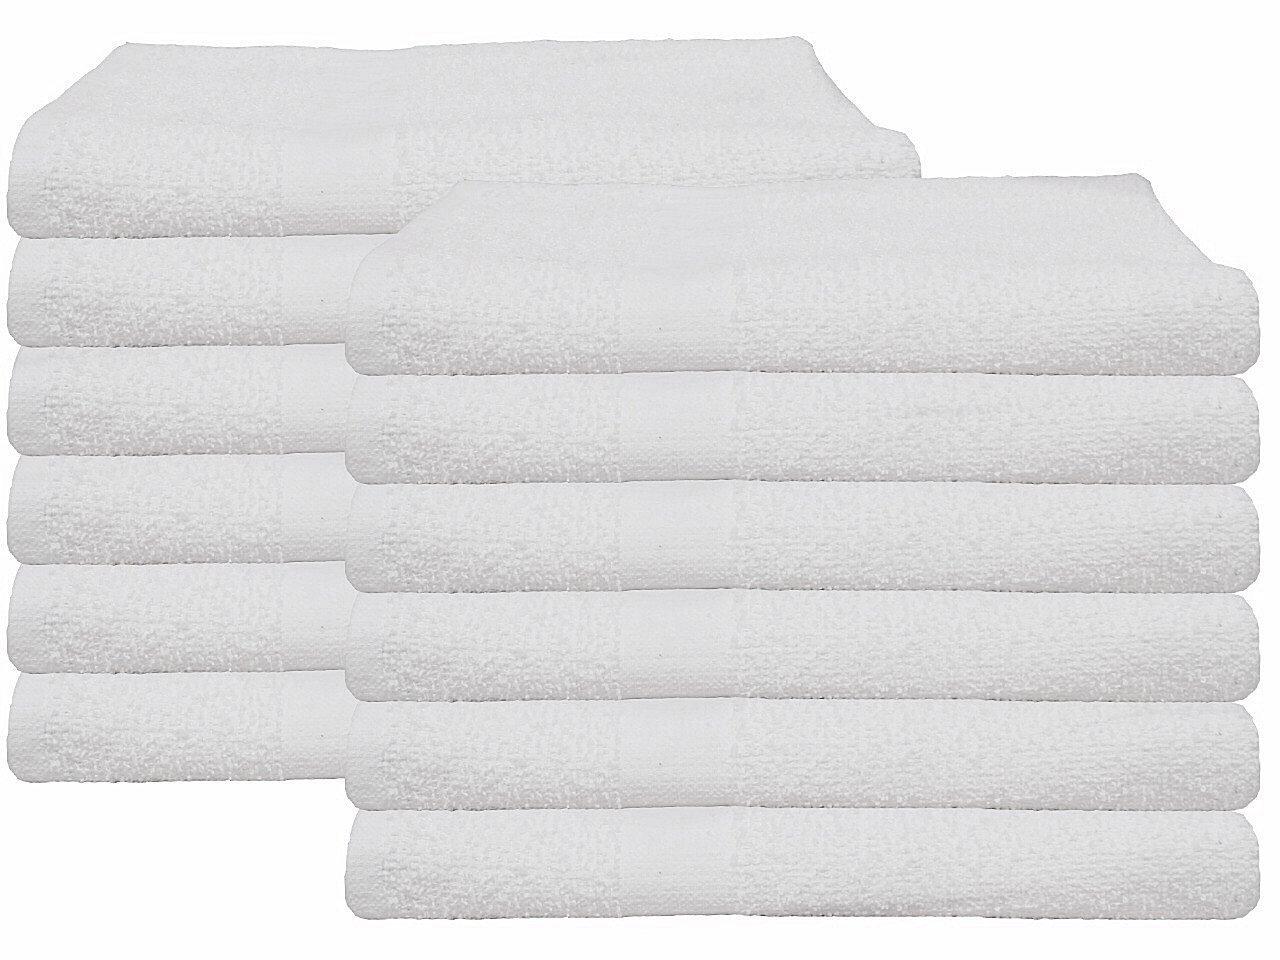 (5 Dozen) 60 PCS NEW WHITE 20X40 100% COTTON ECONOMY BATH TOWELS SOFT & QUICK DRY